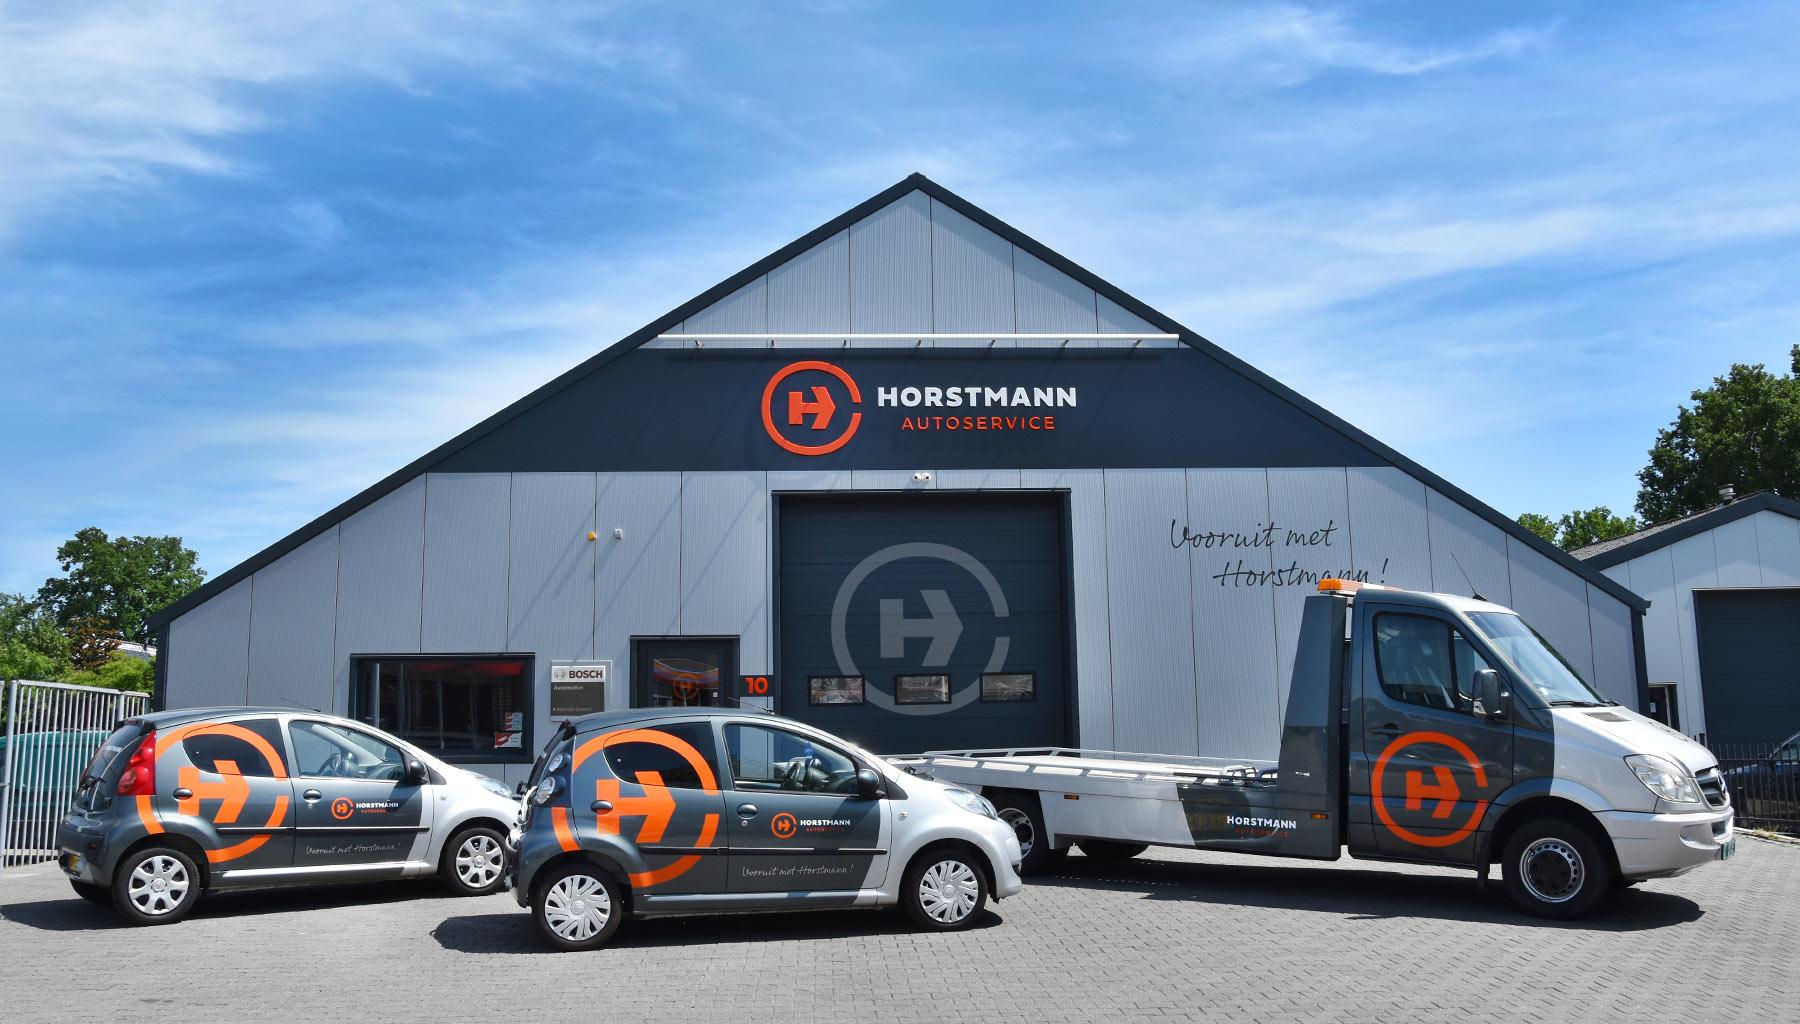 Horstmann Autoservice uit Emmen